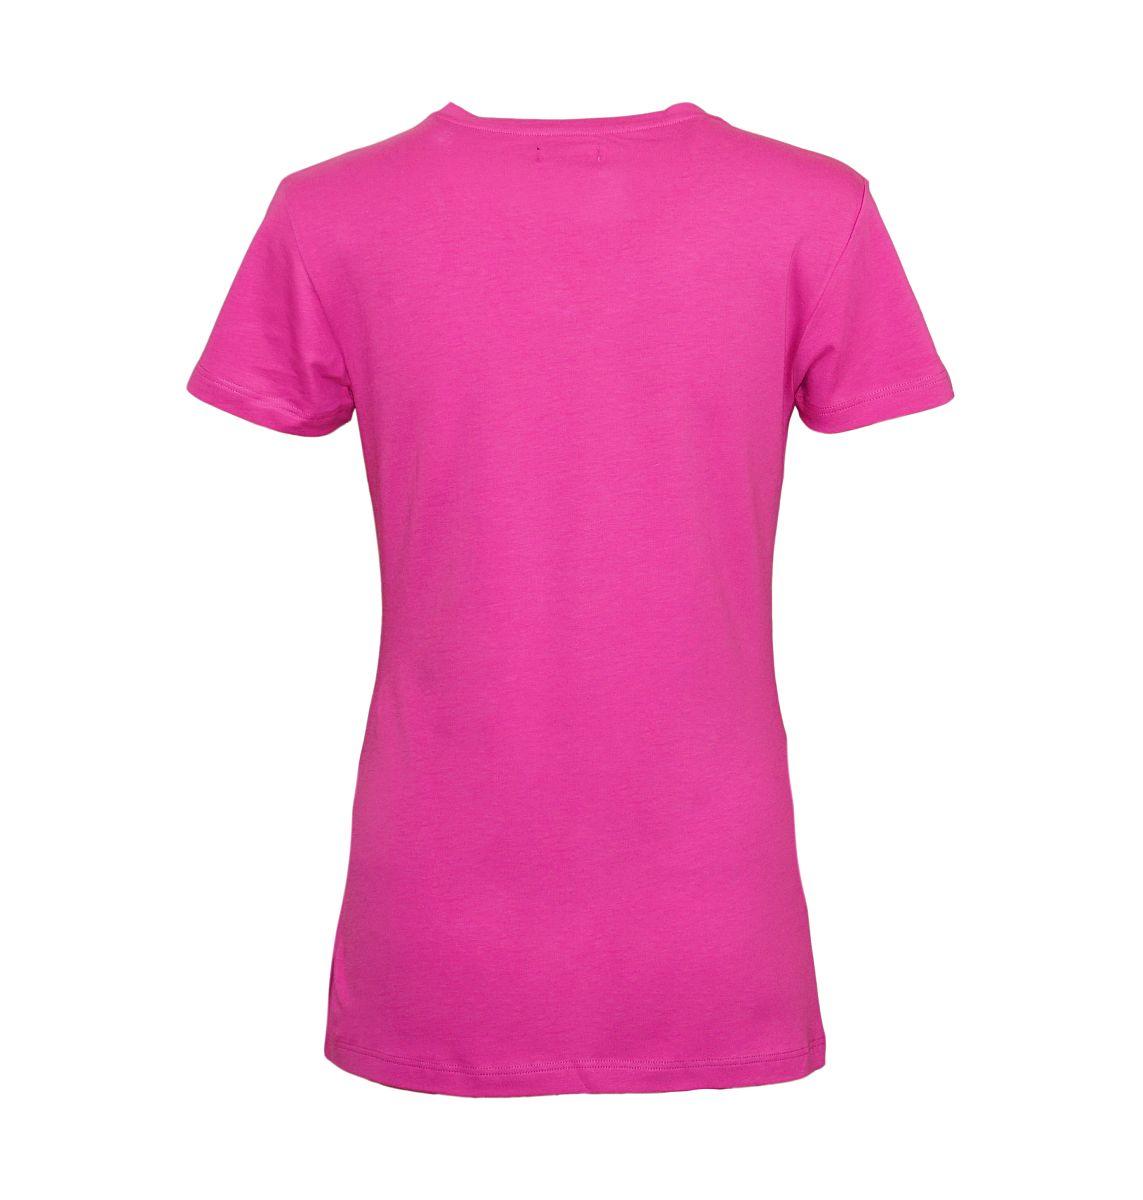 Emporio Armani Damen Shirt T-Shirt Rundhals 163139 7A317 03191 ORCHIDEA HW17-EADS1